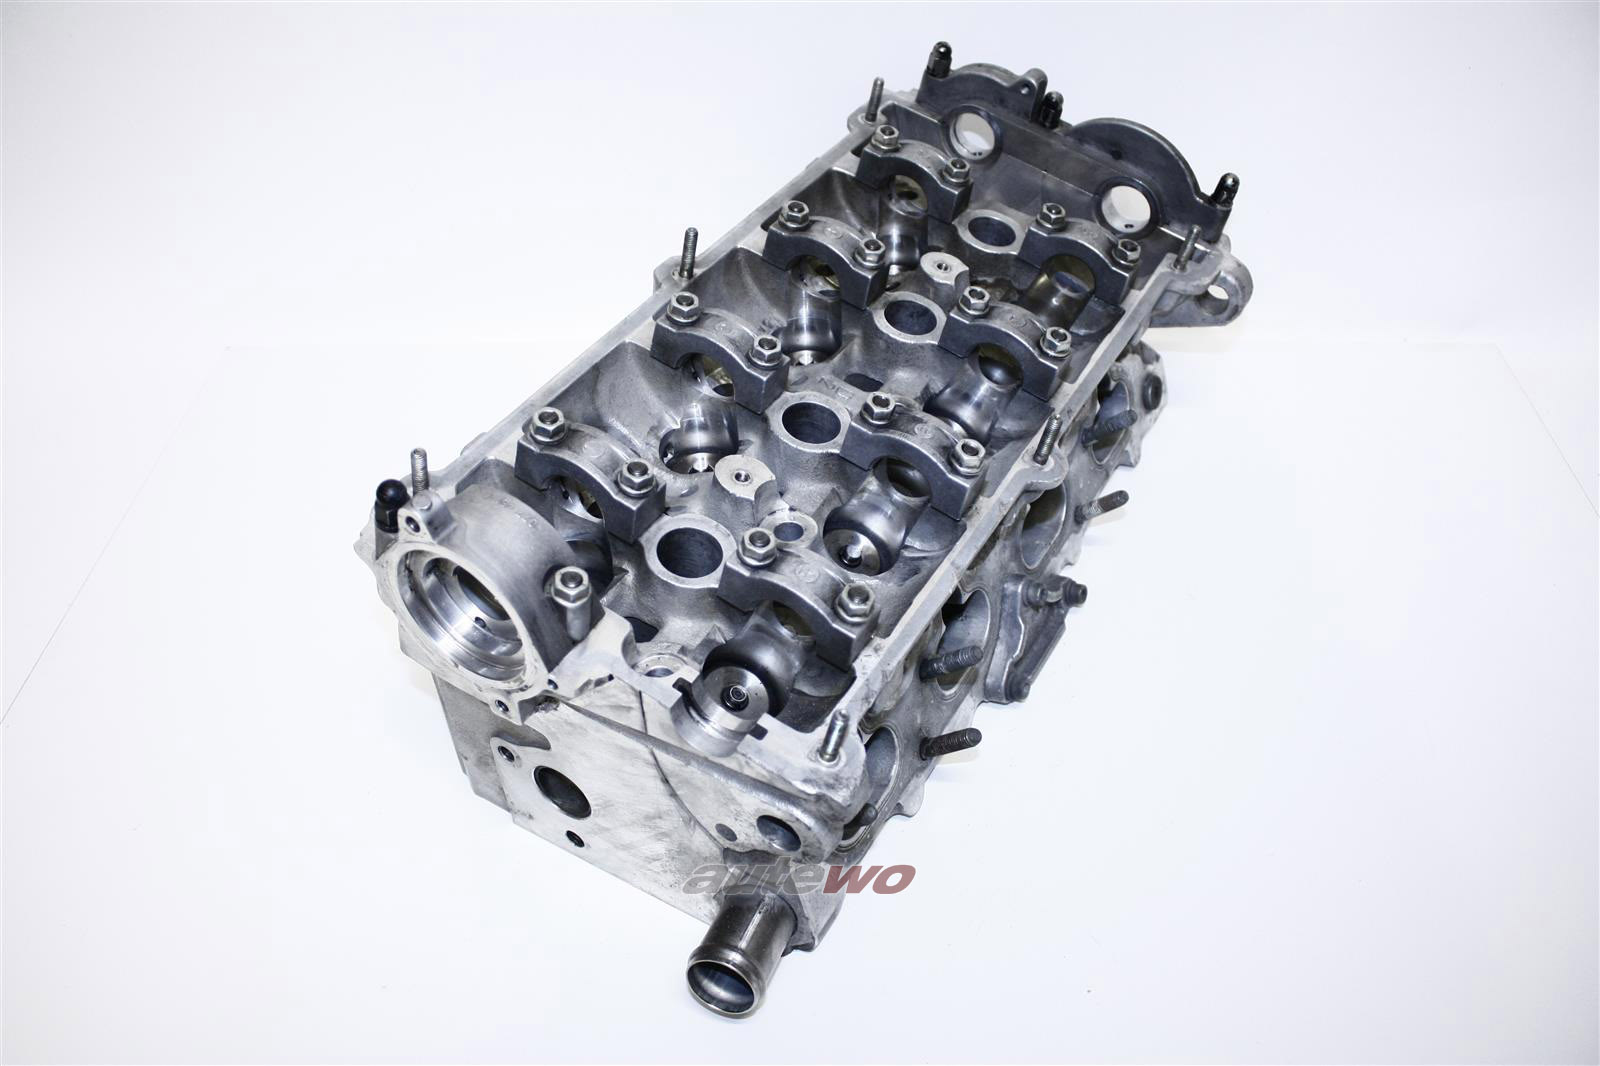 077103351E Audi V8 D11/S4 C4 4.2l 8 Zyl. ABH 001904 Zylinderkopf Rechts